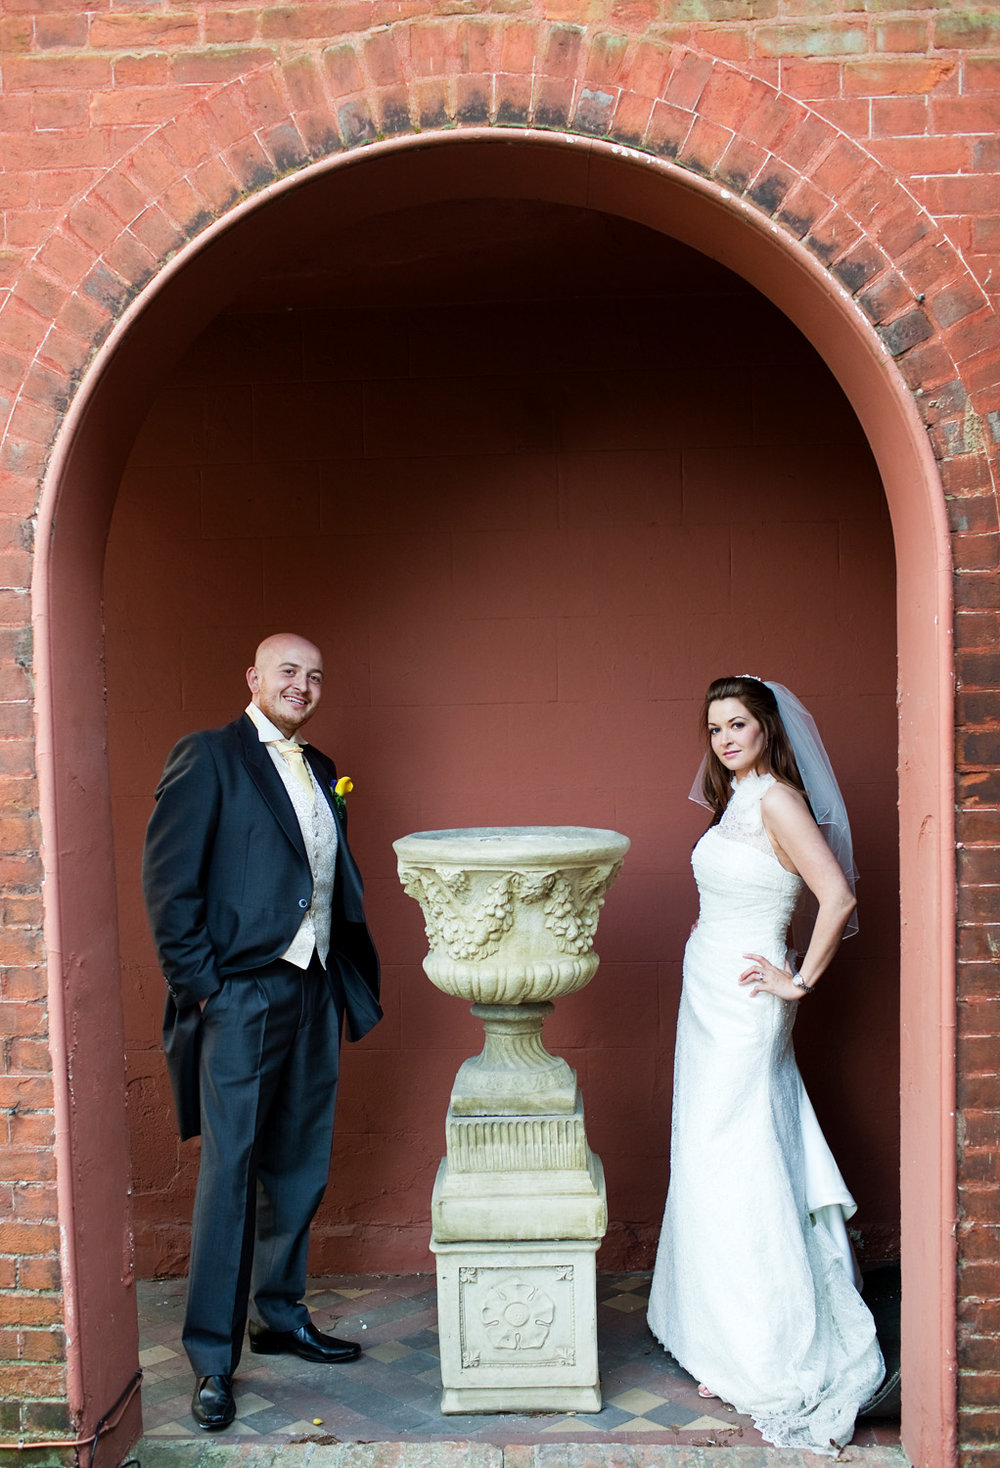 Sir_Christopher_Wren_Hotel_Wedding_Photographer_Windsor_032.jpg